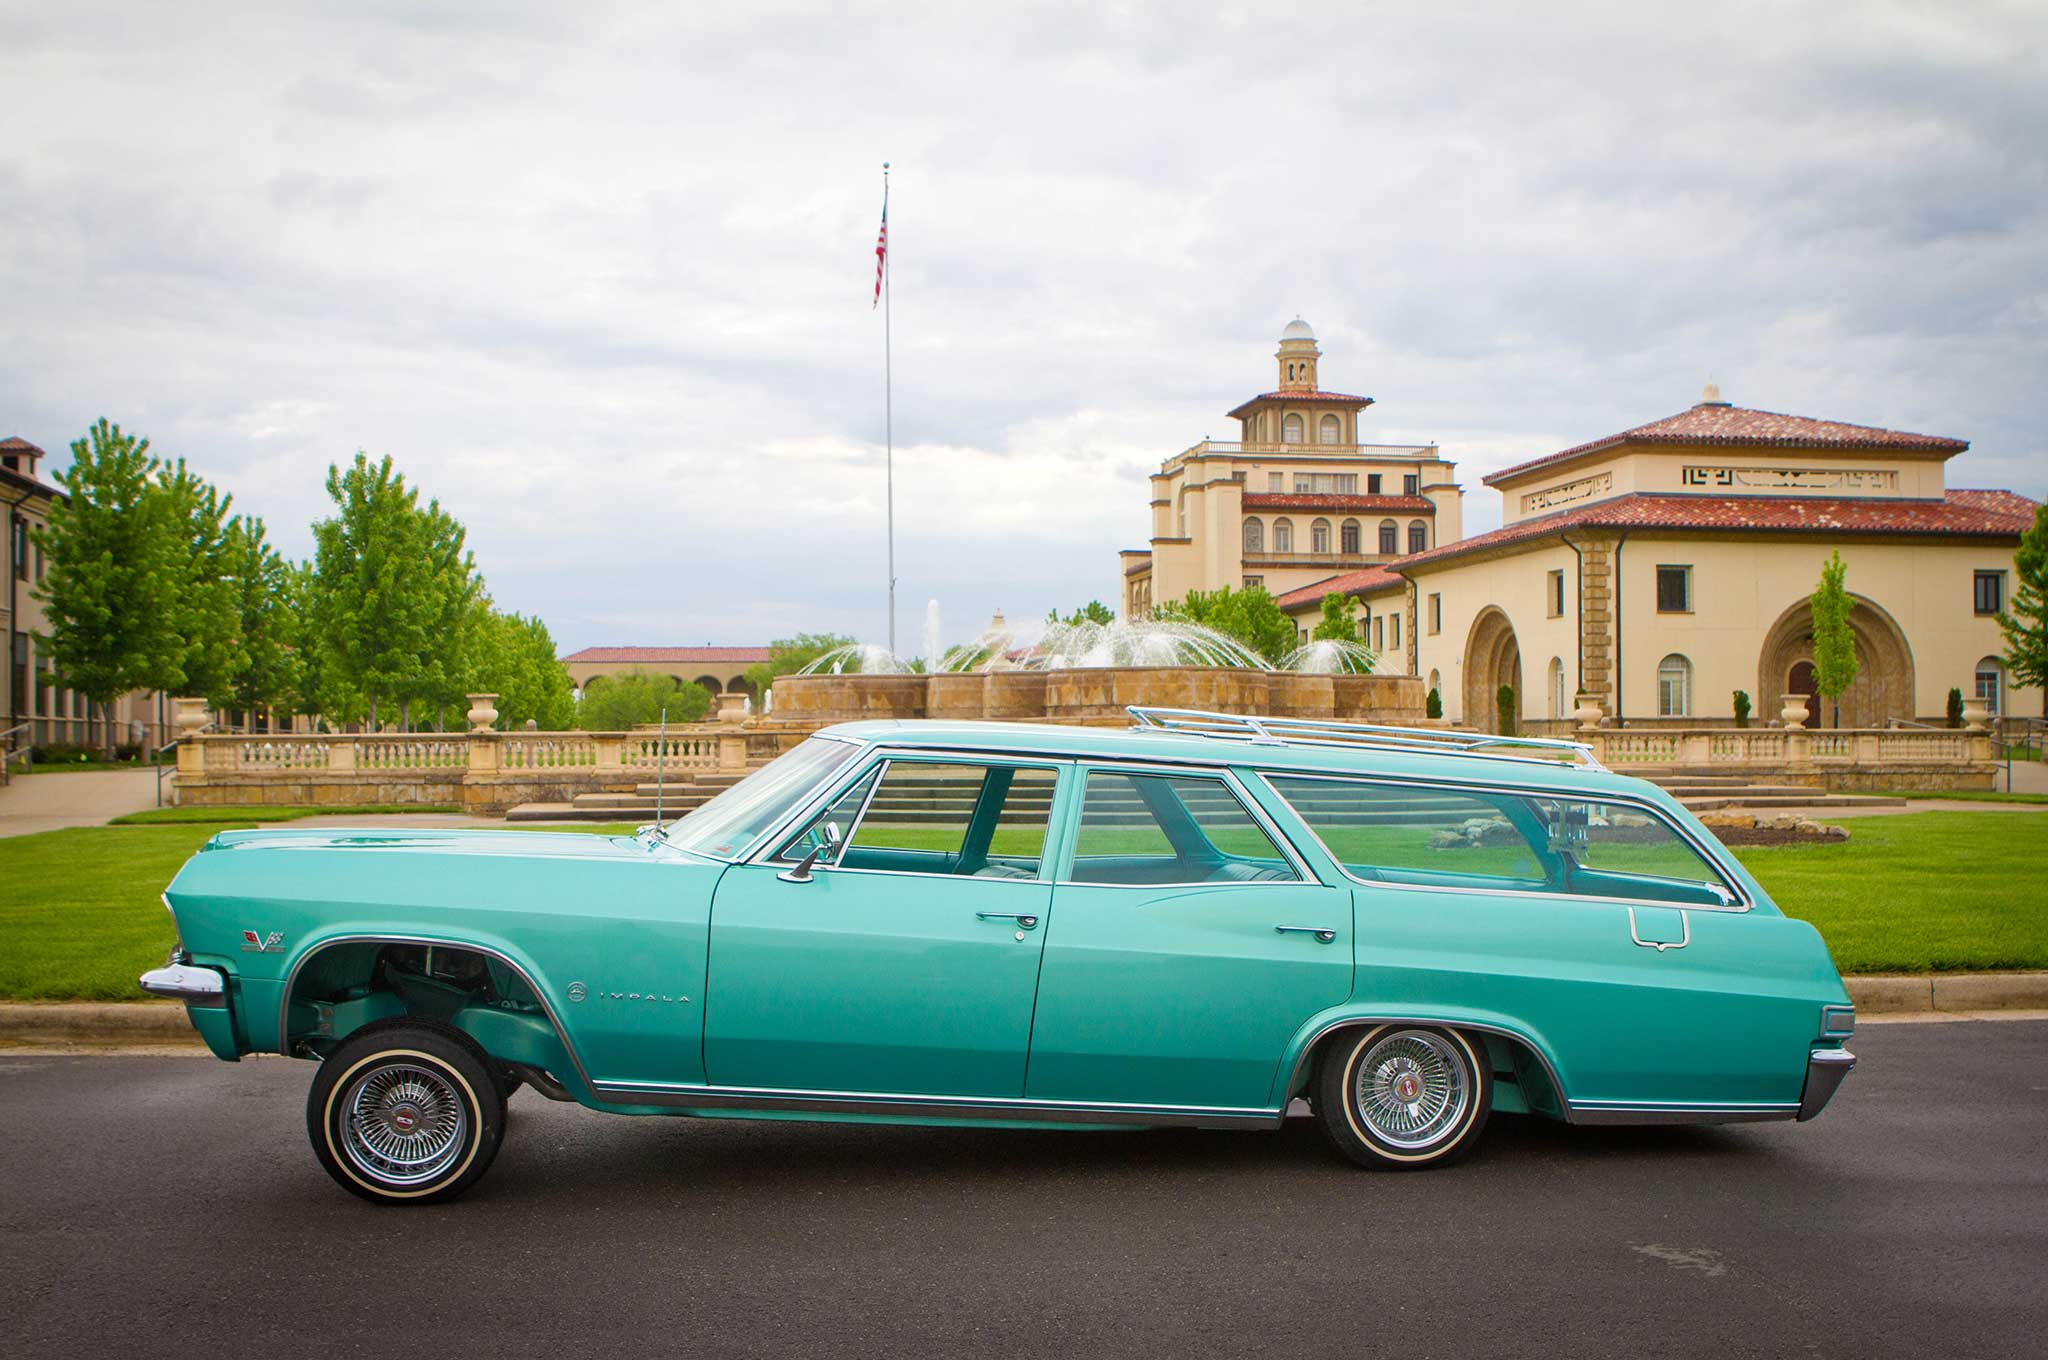 1965 Chevrolet Impala Wagon - Outside the Box - Lowrider